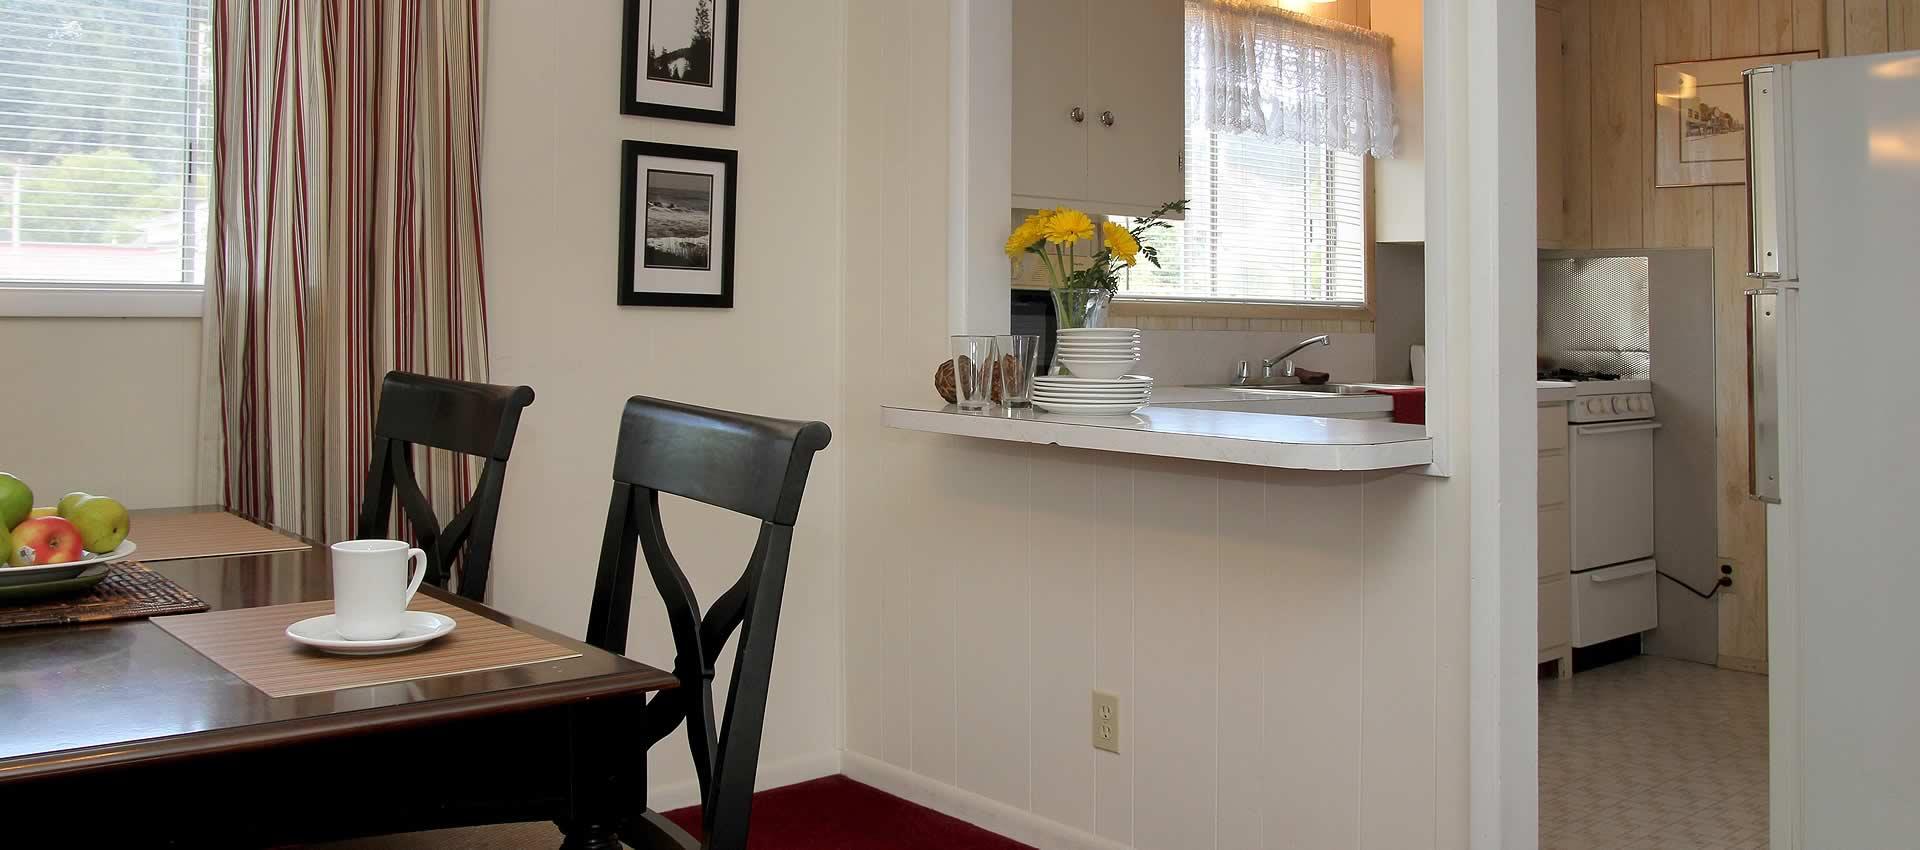 Guthrie Creek Family Suite kitchen